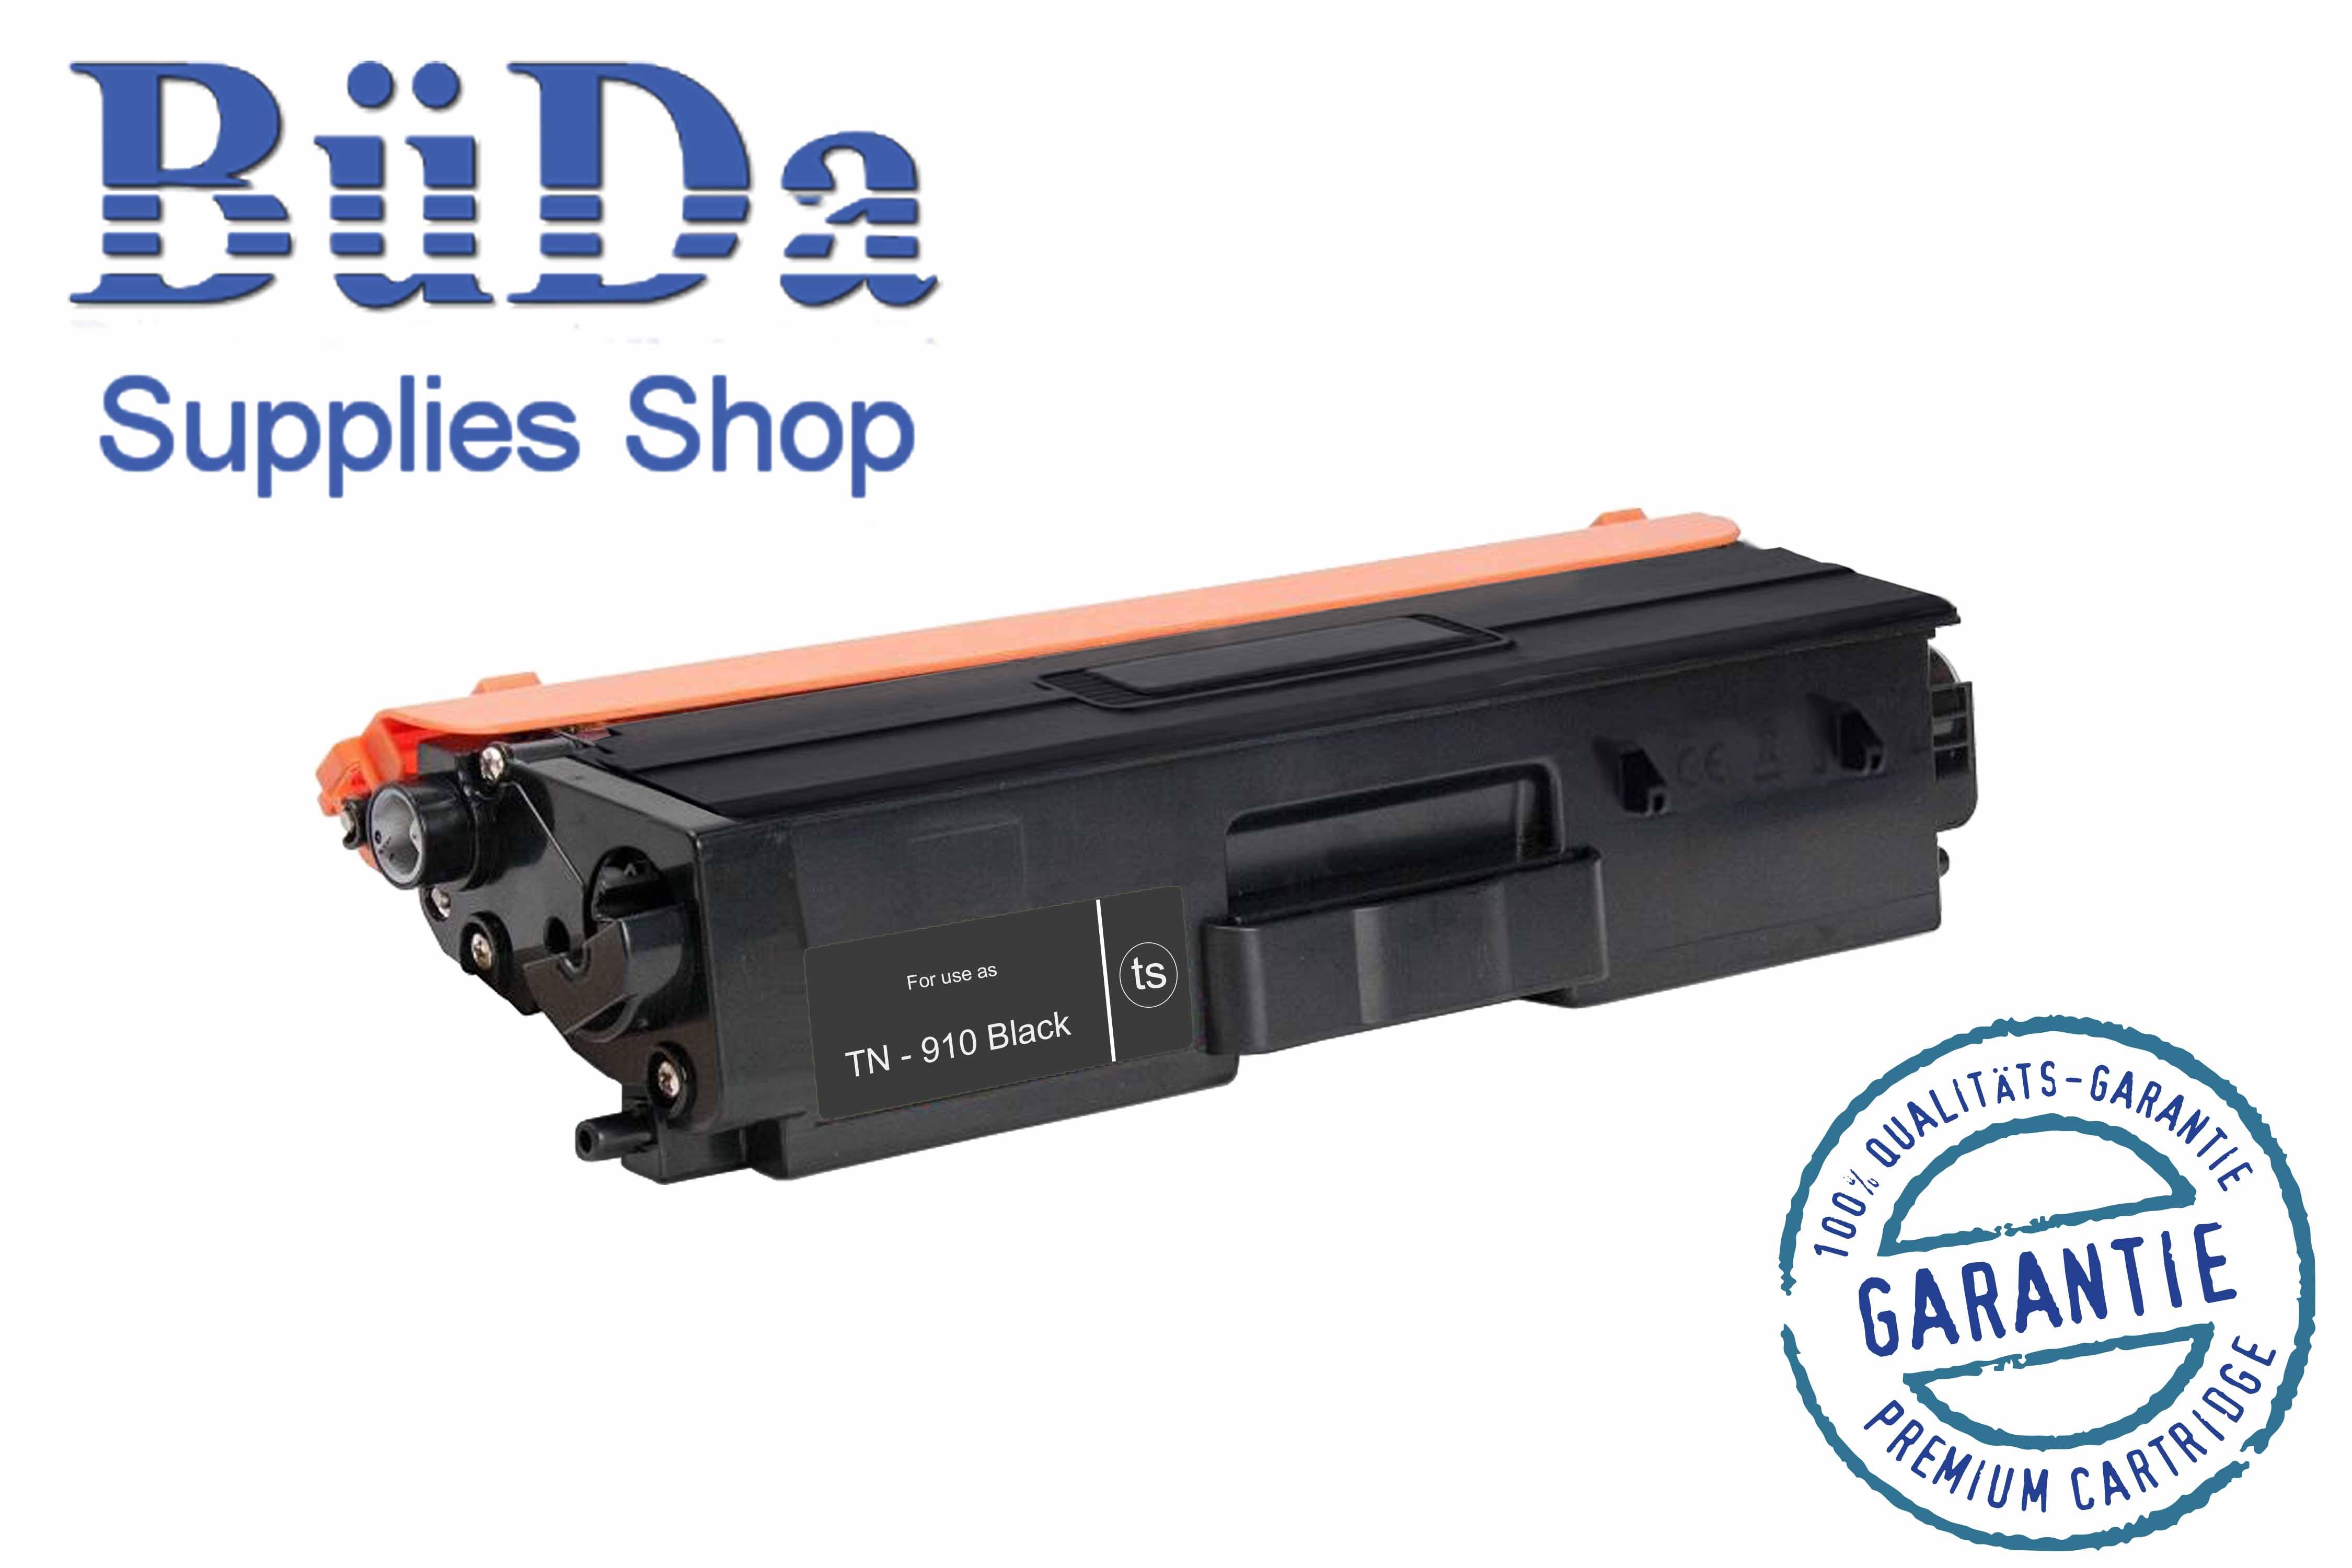 Toner-Modul komp. zu TN-910BK black 9000 Seiten